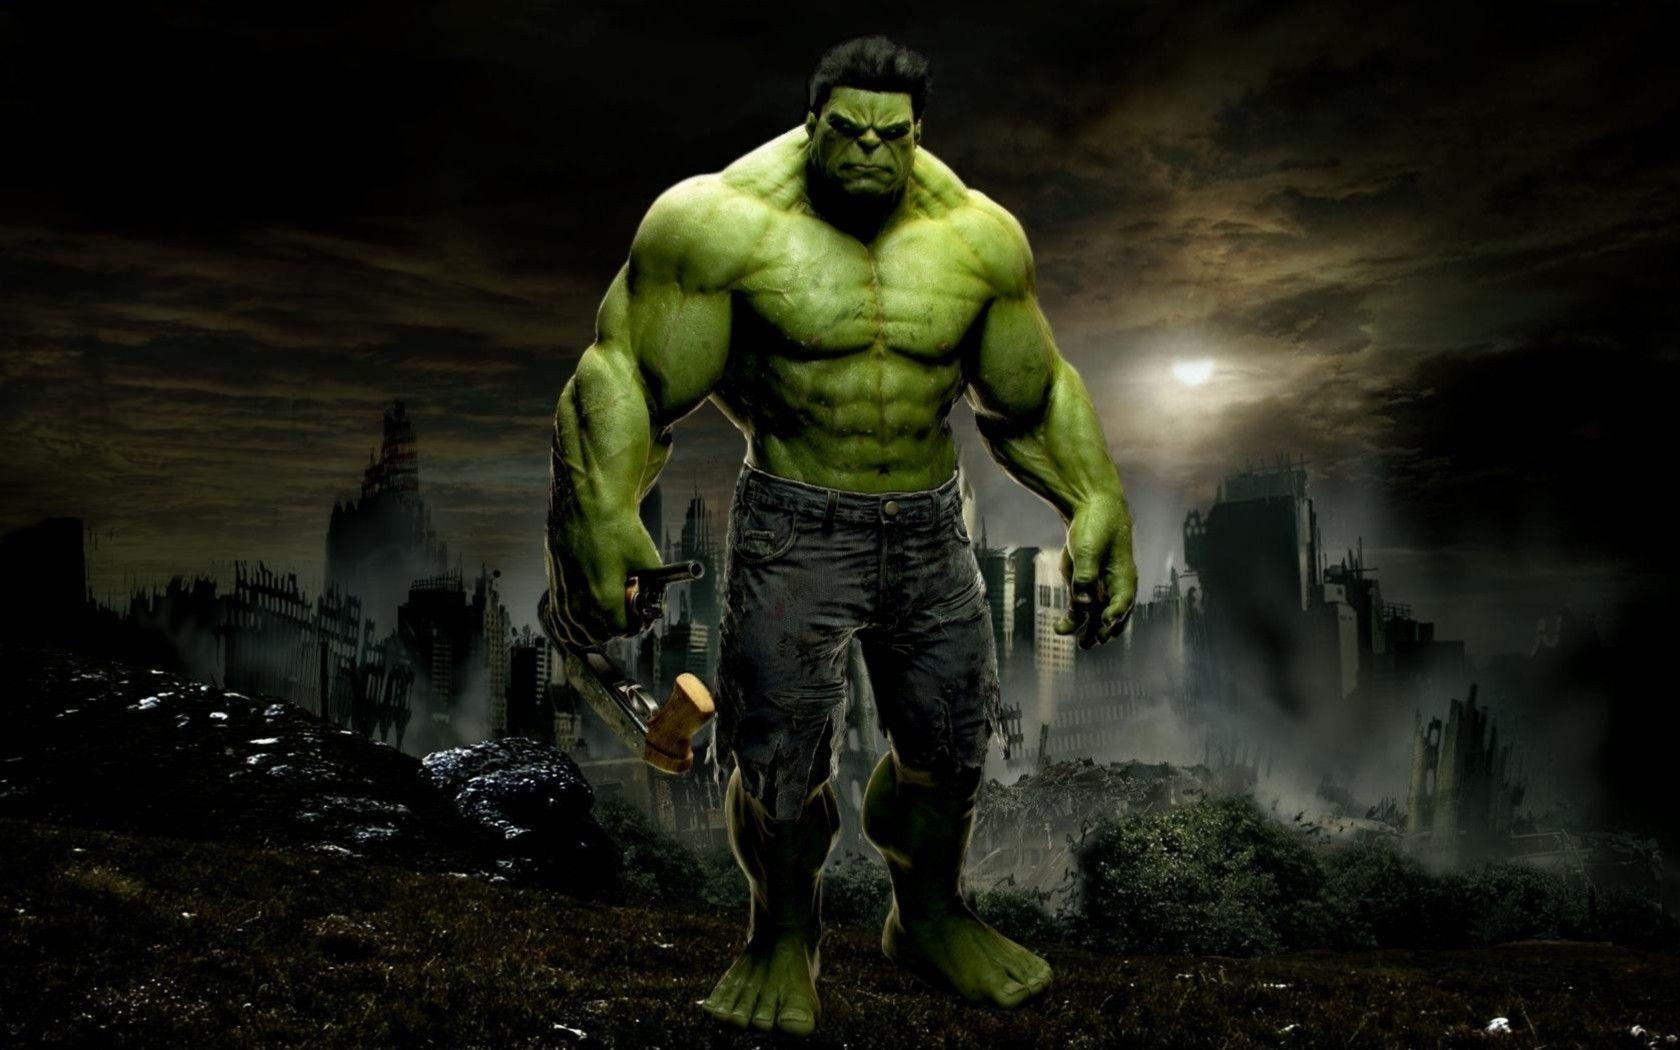 10 Best Cool Hulk Hd Wallpapers Full Hd 1920 1080 For Pc Background In 2020 Hero Wallpaper Hero Wallpapers Hd Avengers Wallpaper